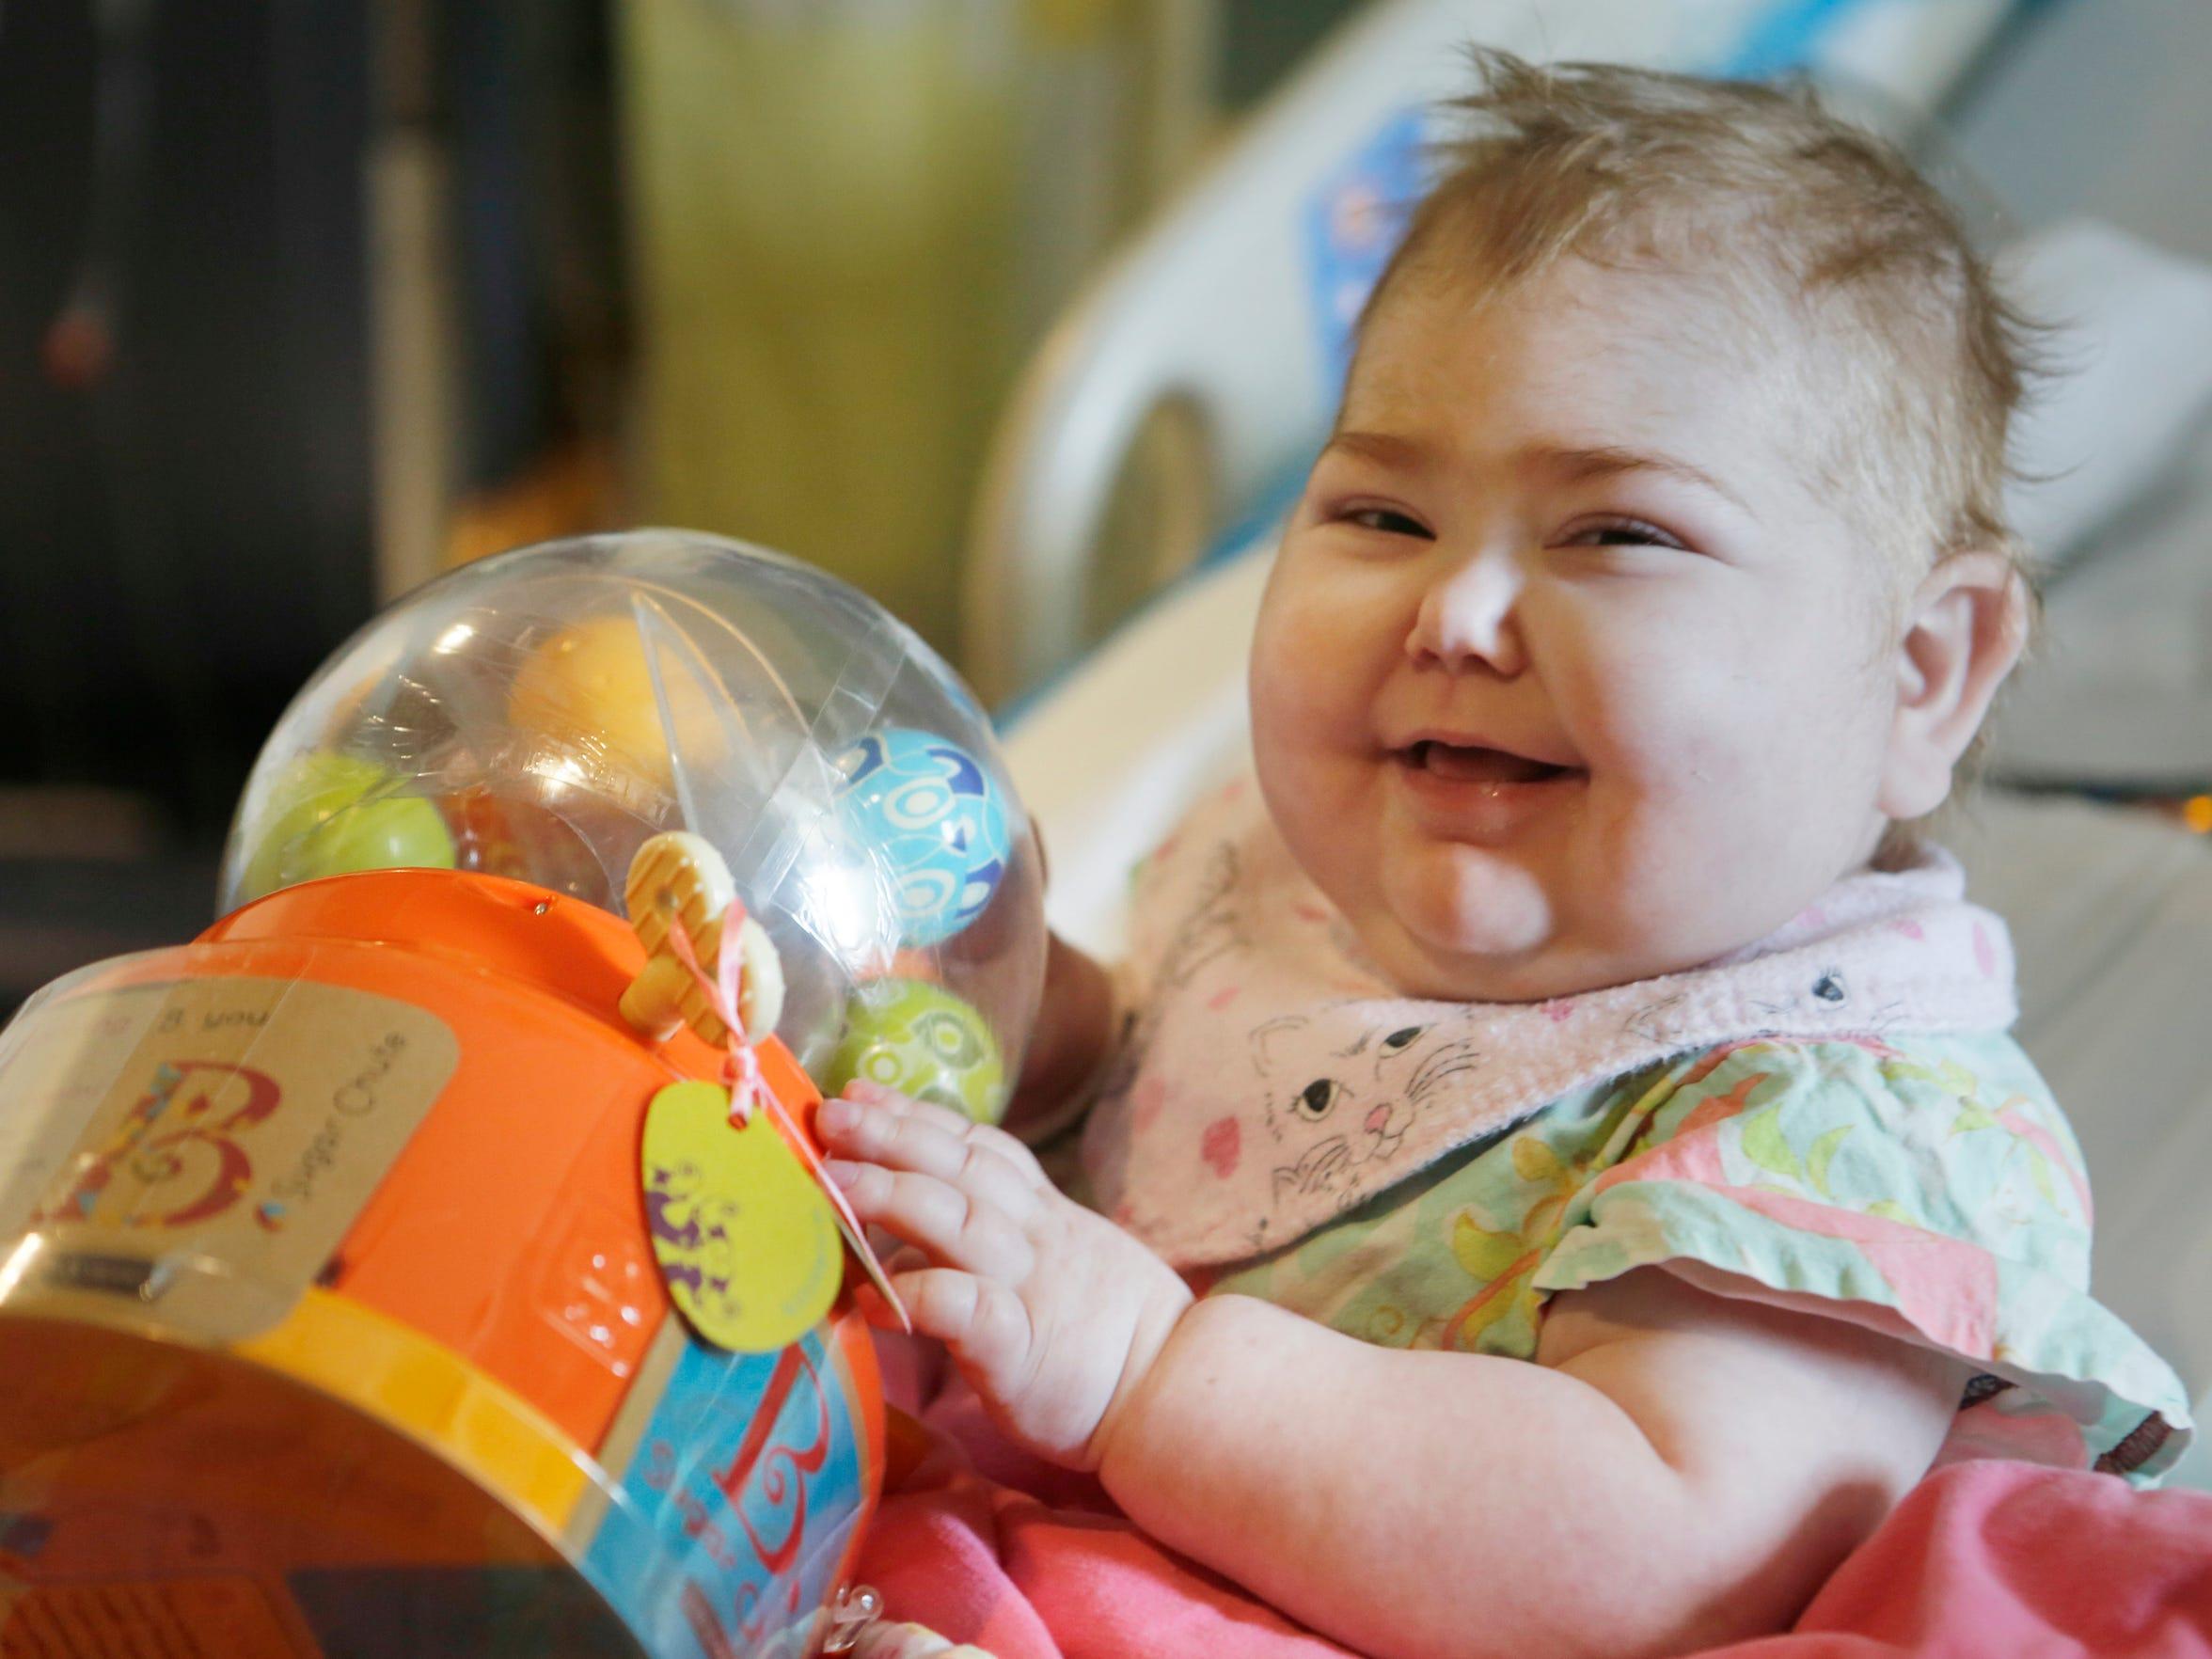 Eliza Miller, 2, has a rare autoimmune disease, for